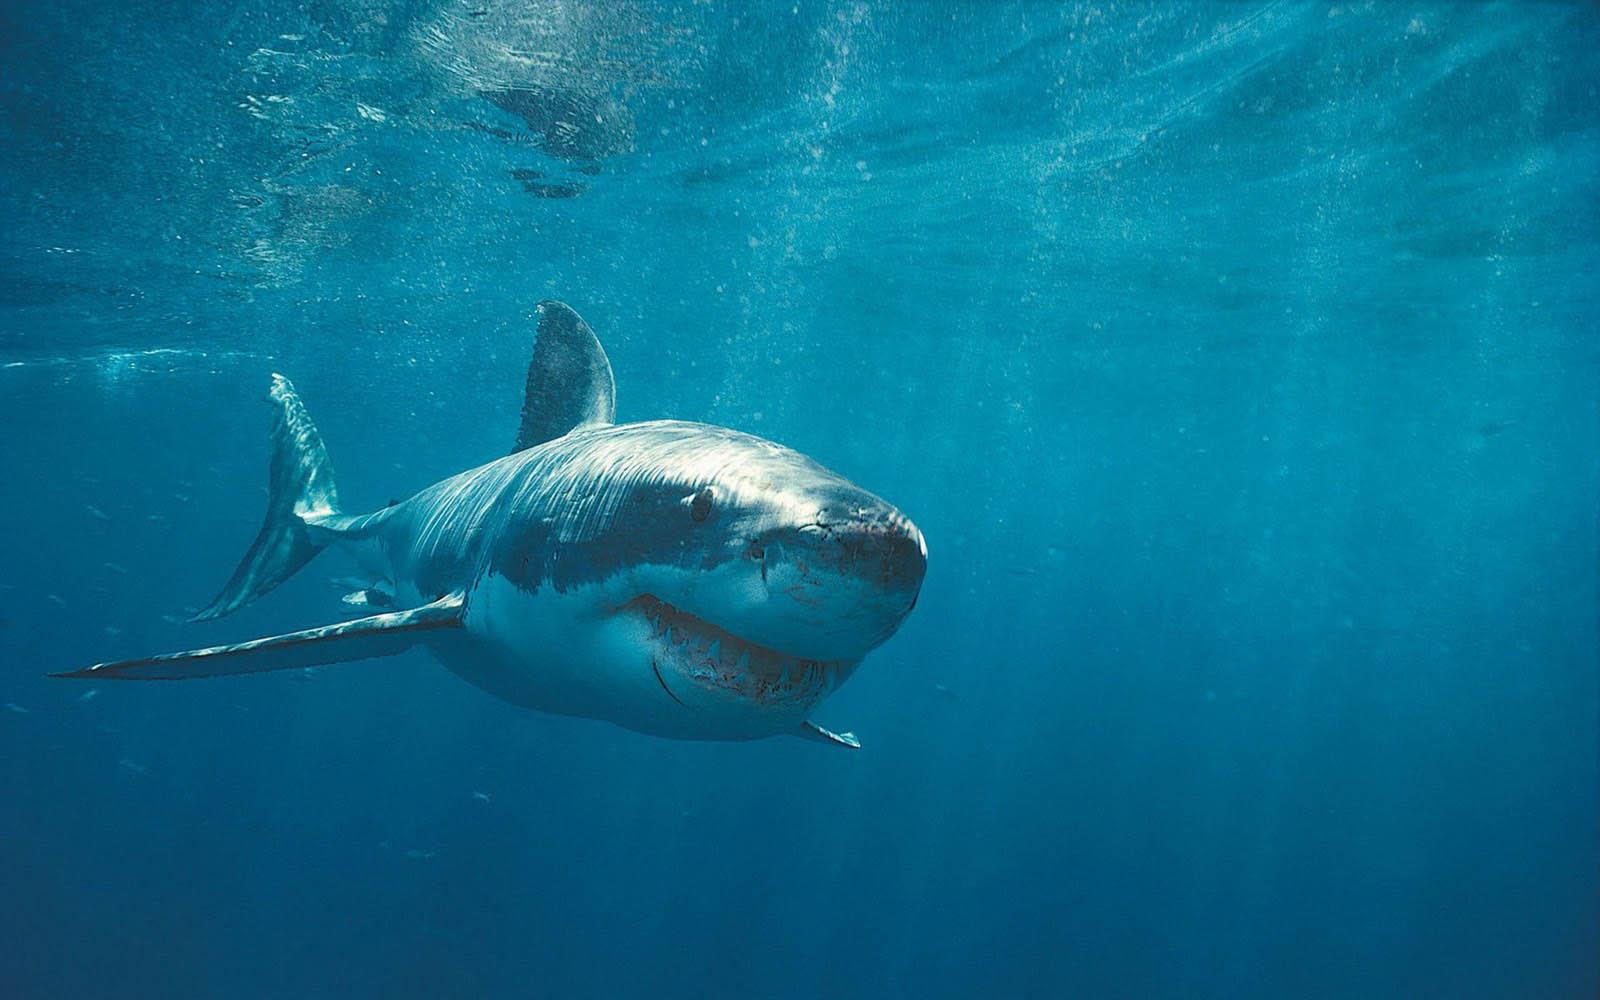 download shark wallpapers wallpaper - photo #32